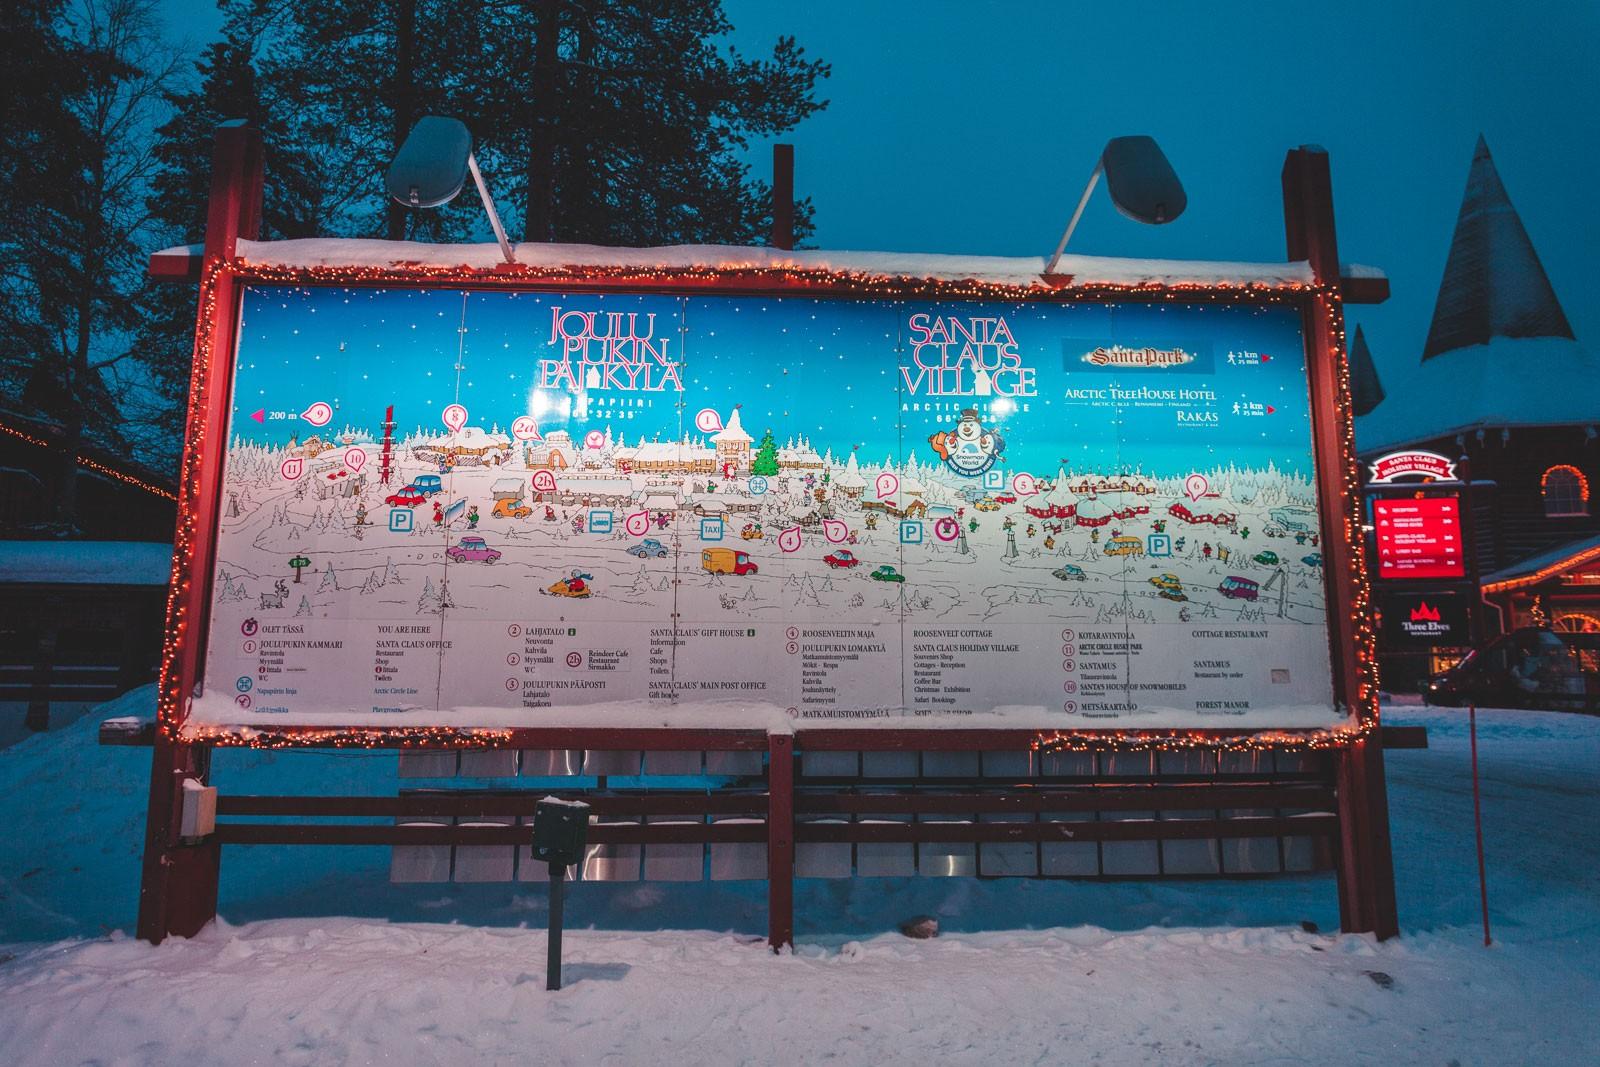 ninaah bulles, voyage, Laponie, rovaniemi, village du père noël, Finlande